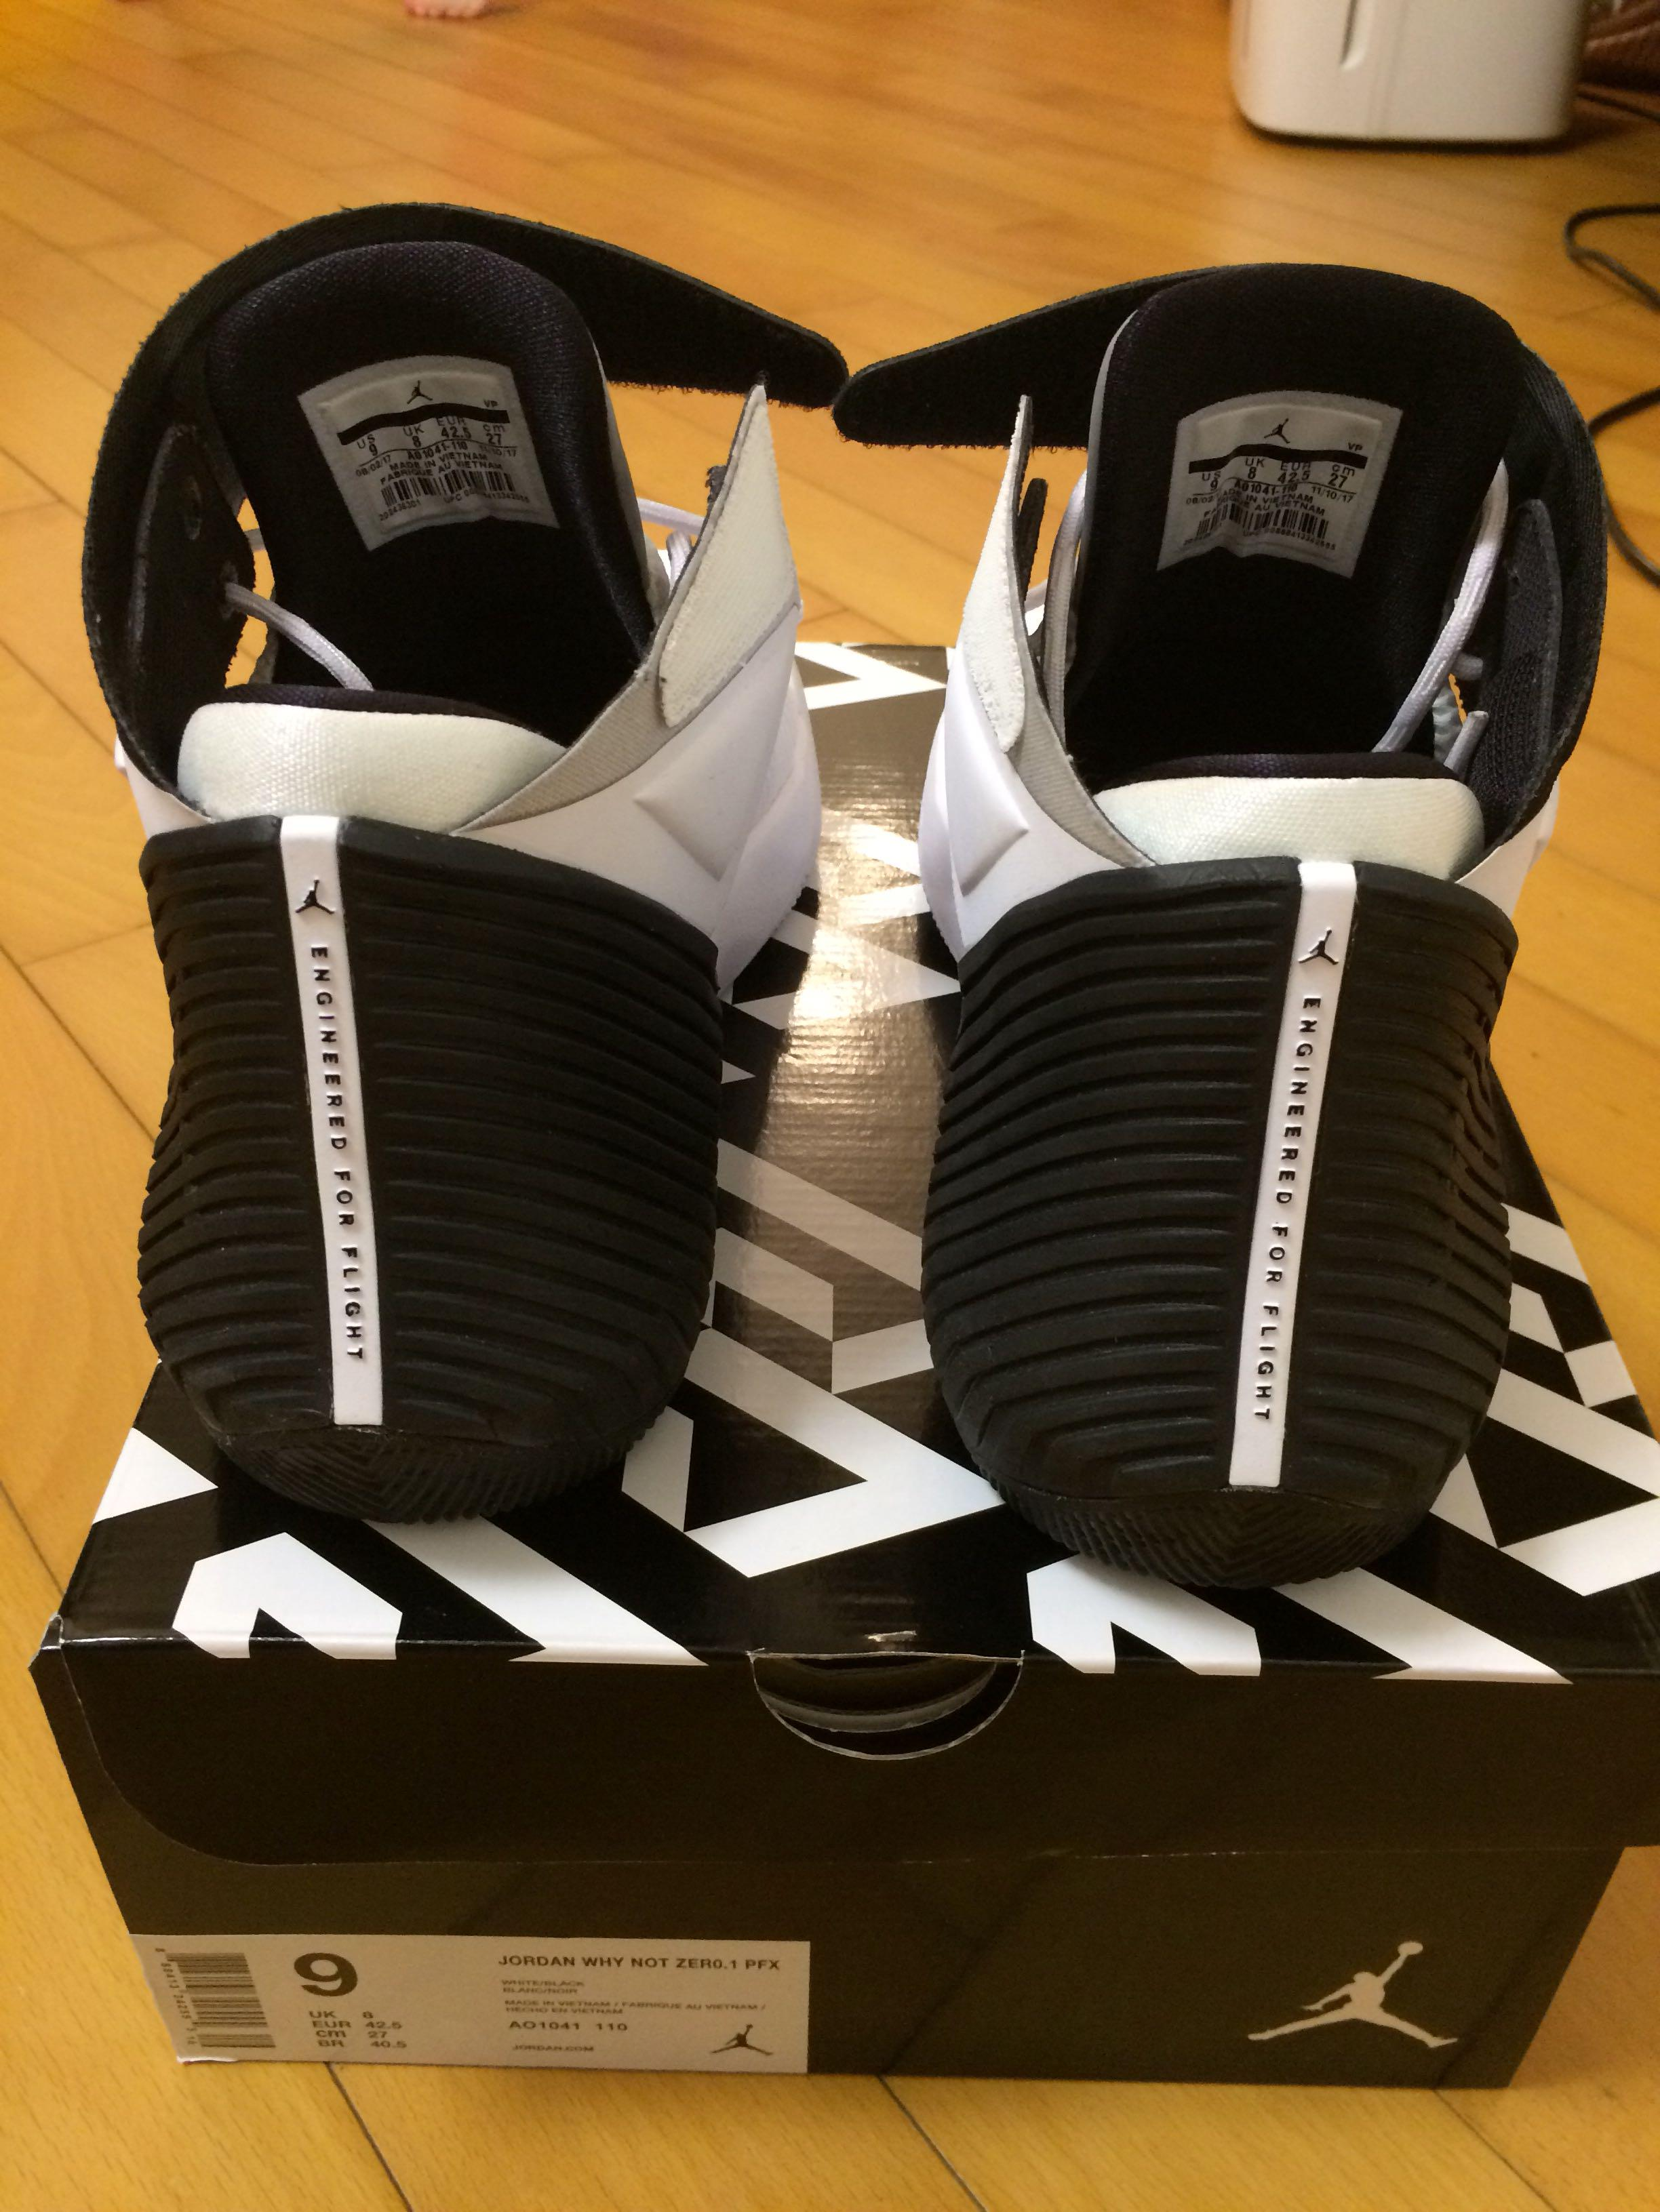 Nike Air Jordan Why Not Zero.1 PFX